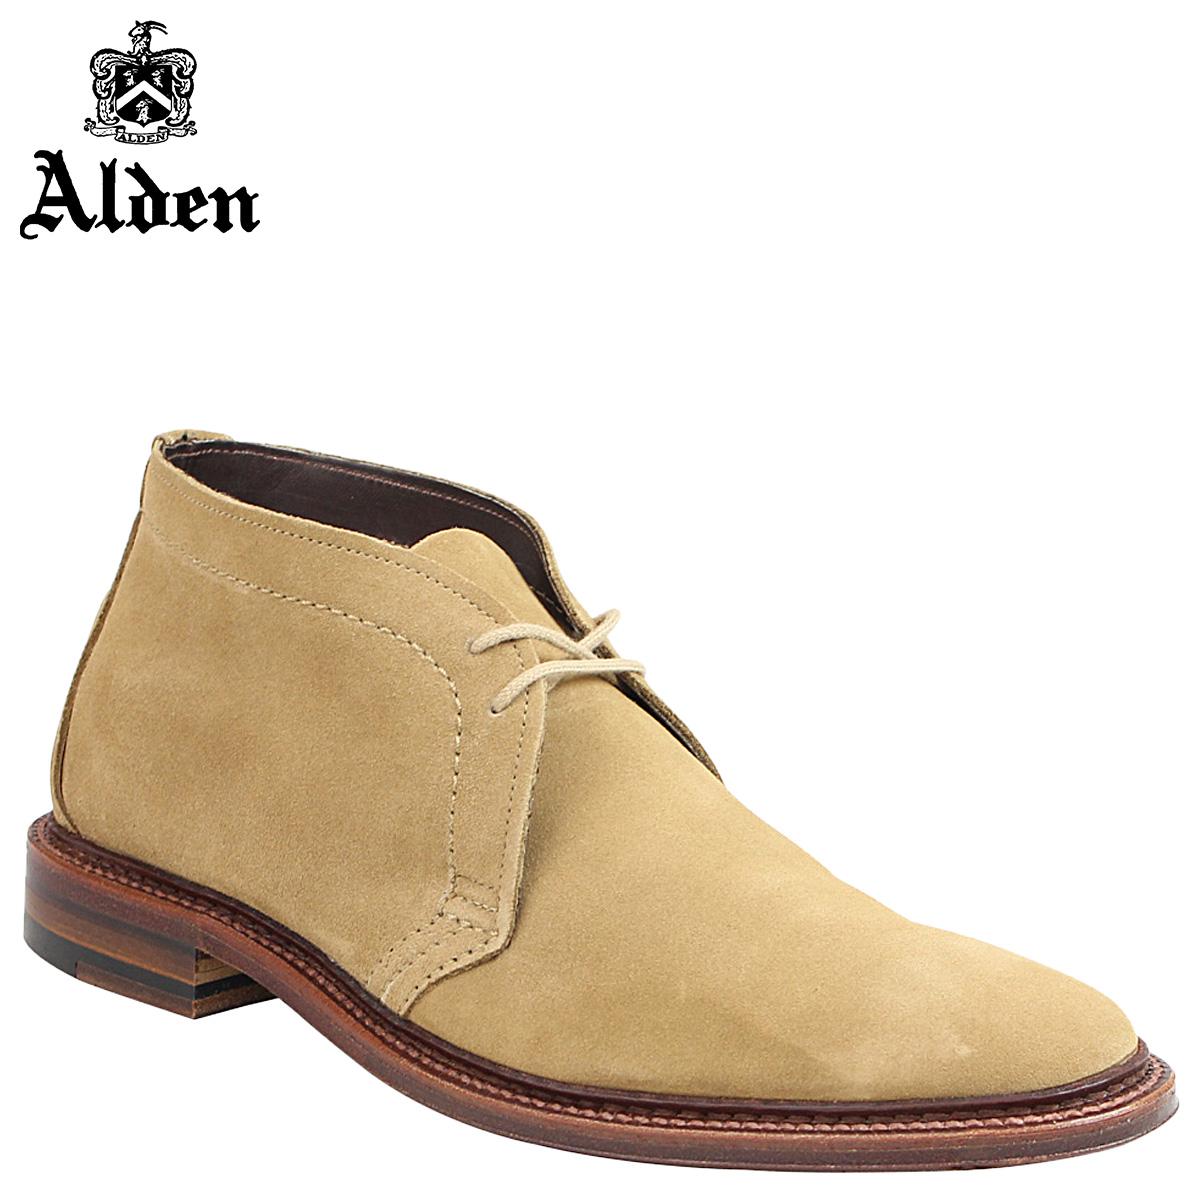 Allsports Alden Alden Chukka Boot Unlined Chukka D Wise